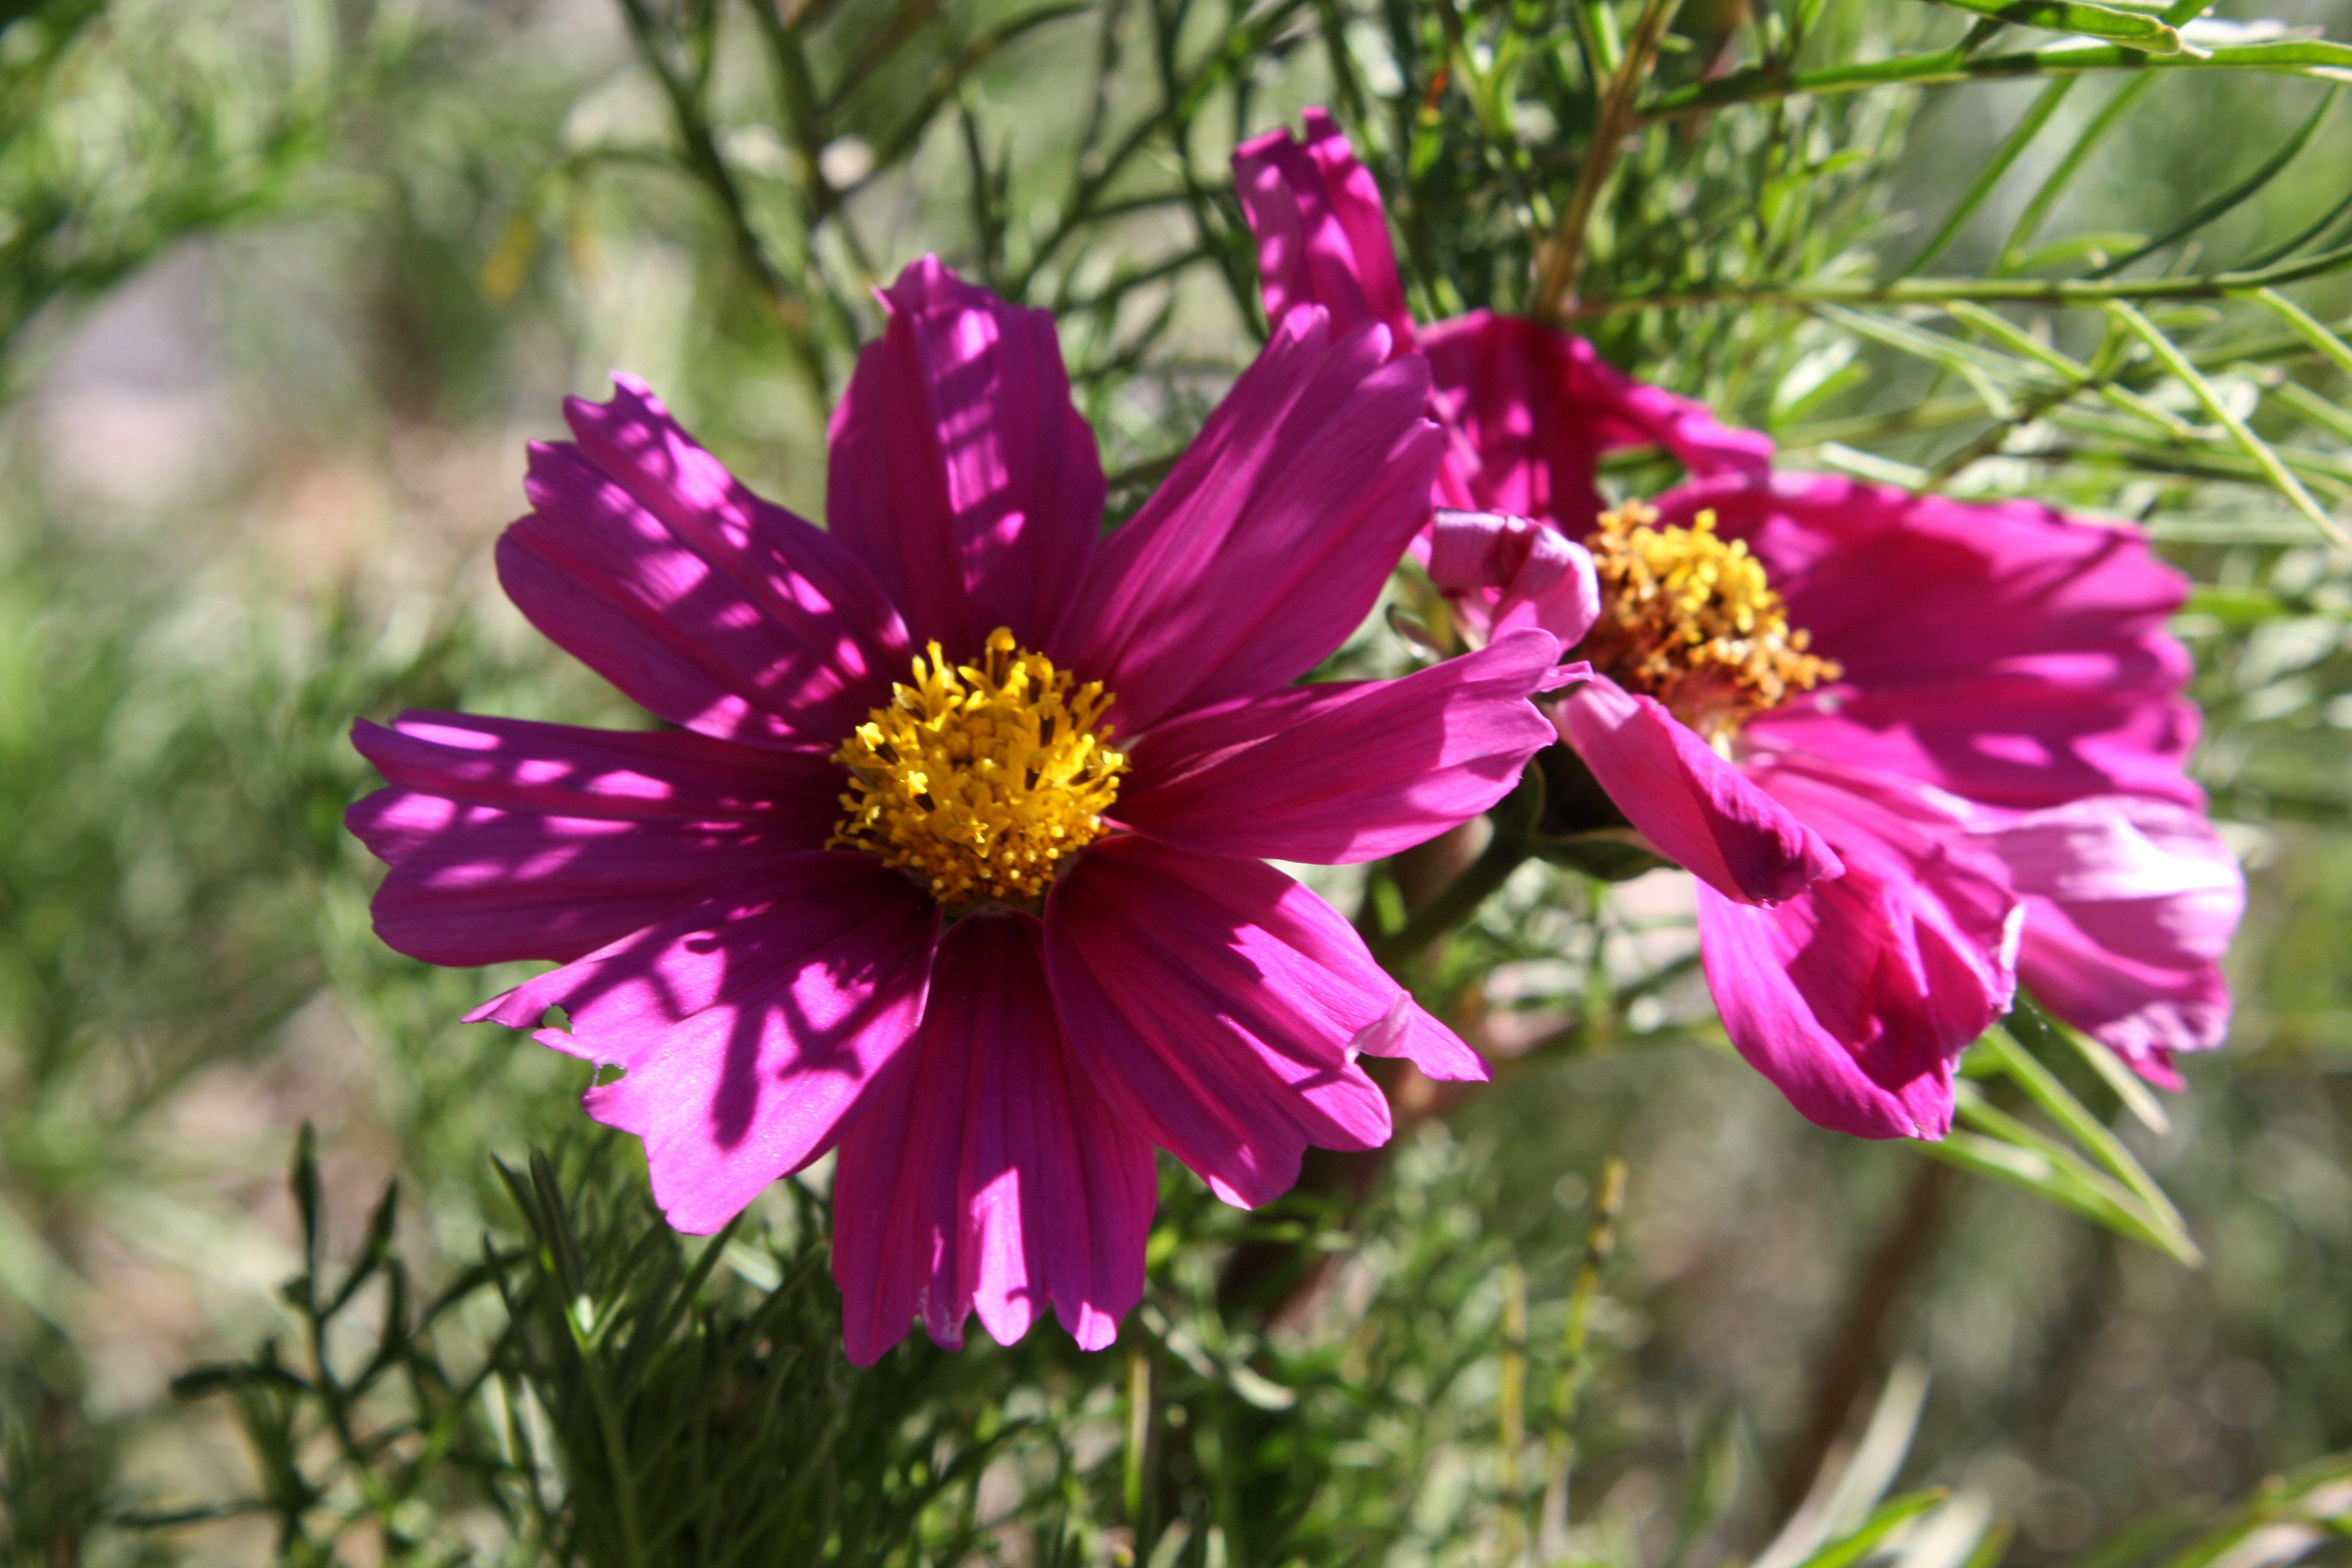 purple cosmos flowers picture free photograph photos public domain